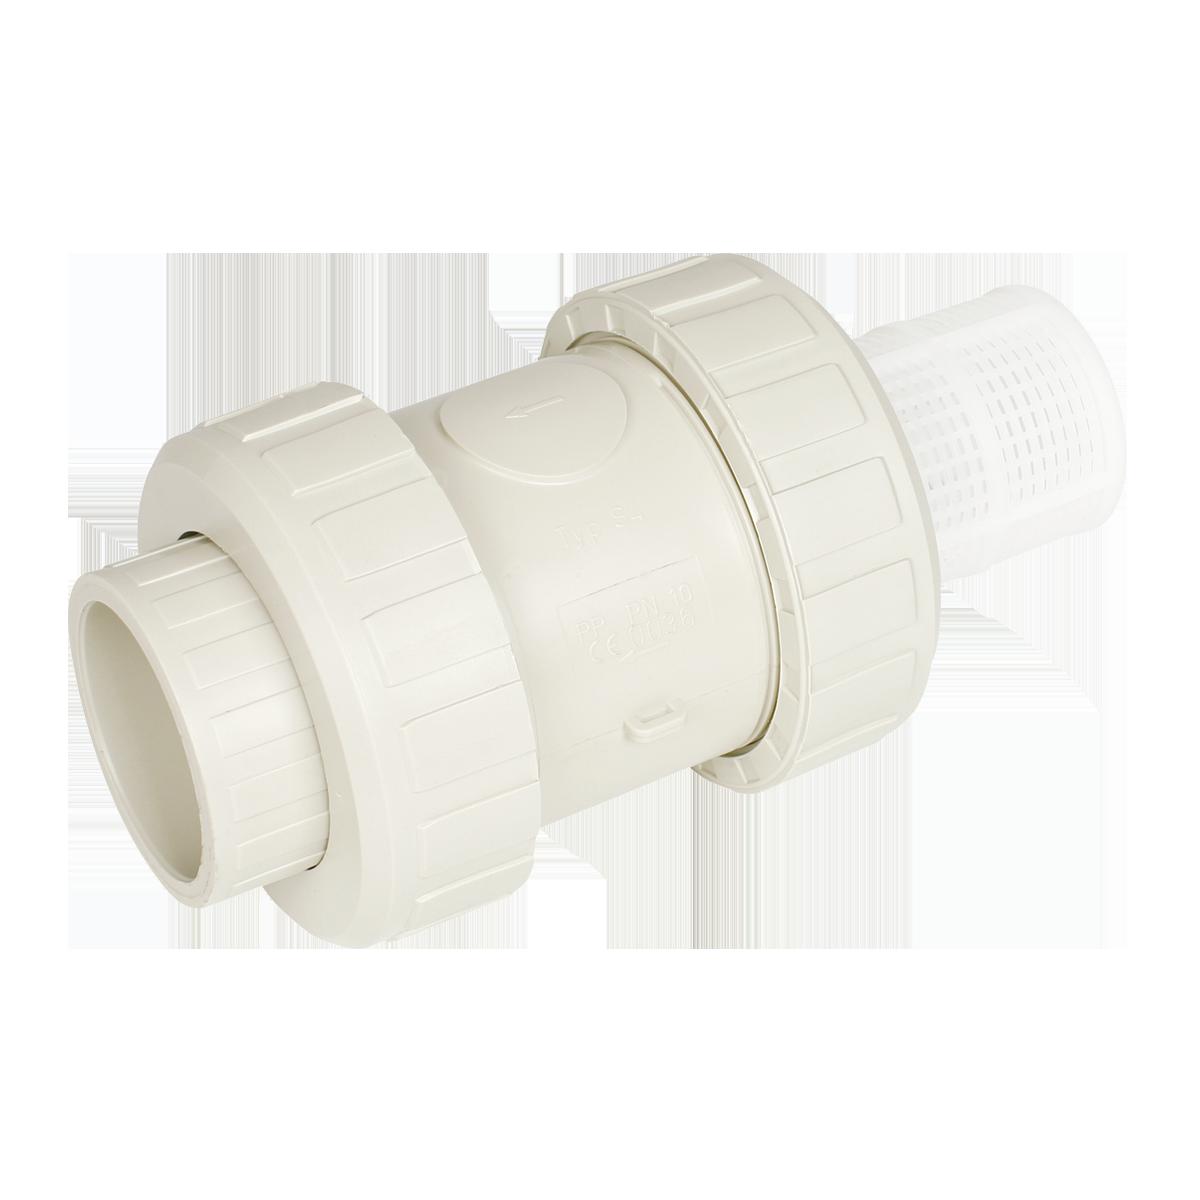 Praher foot valve S4 PP, white, beige